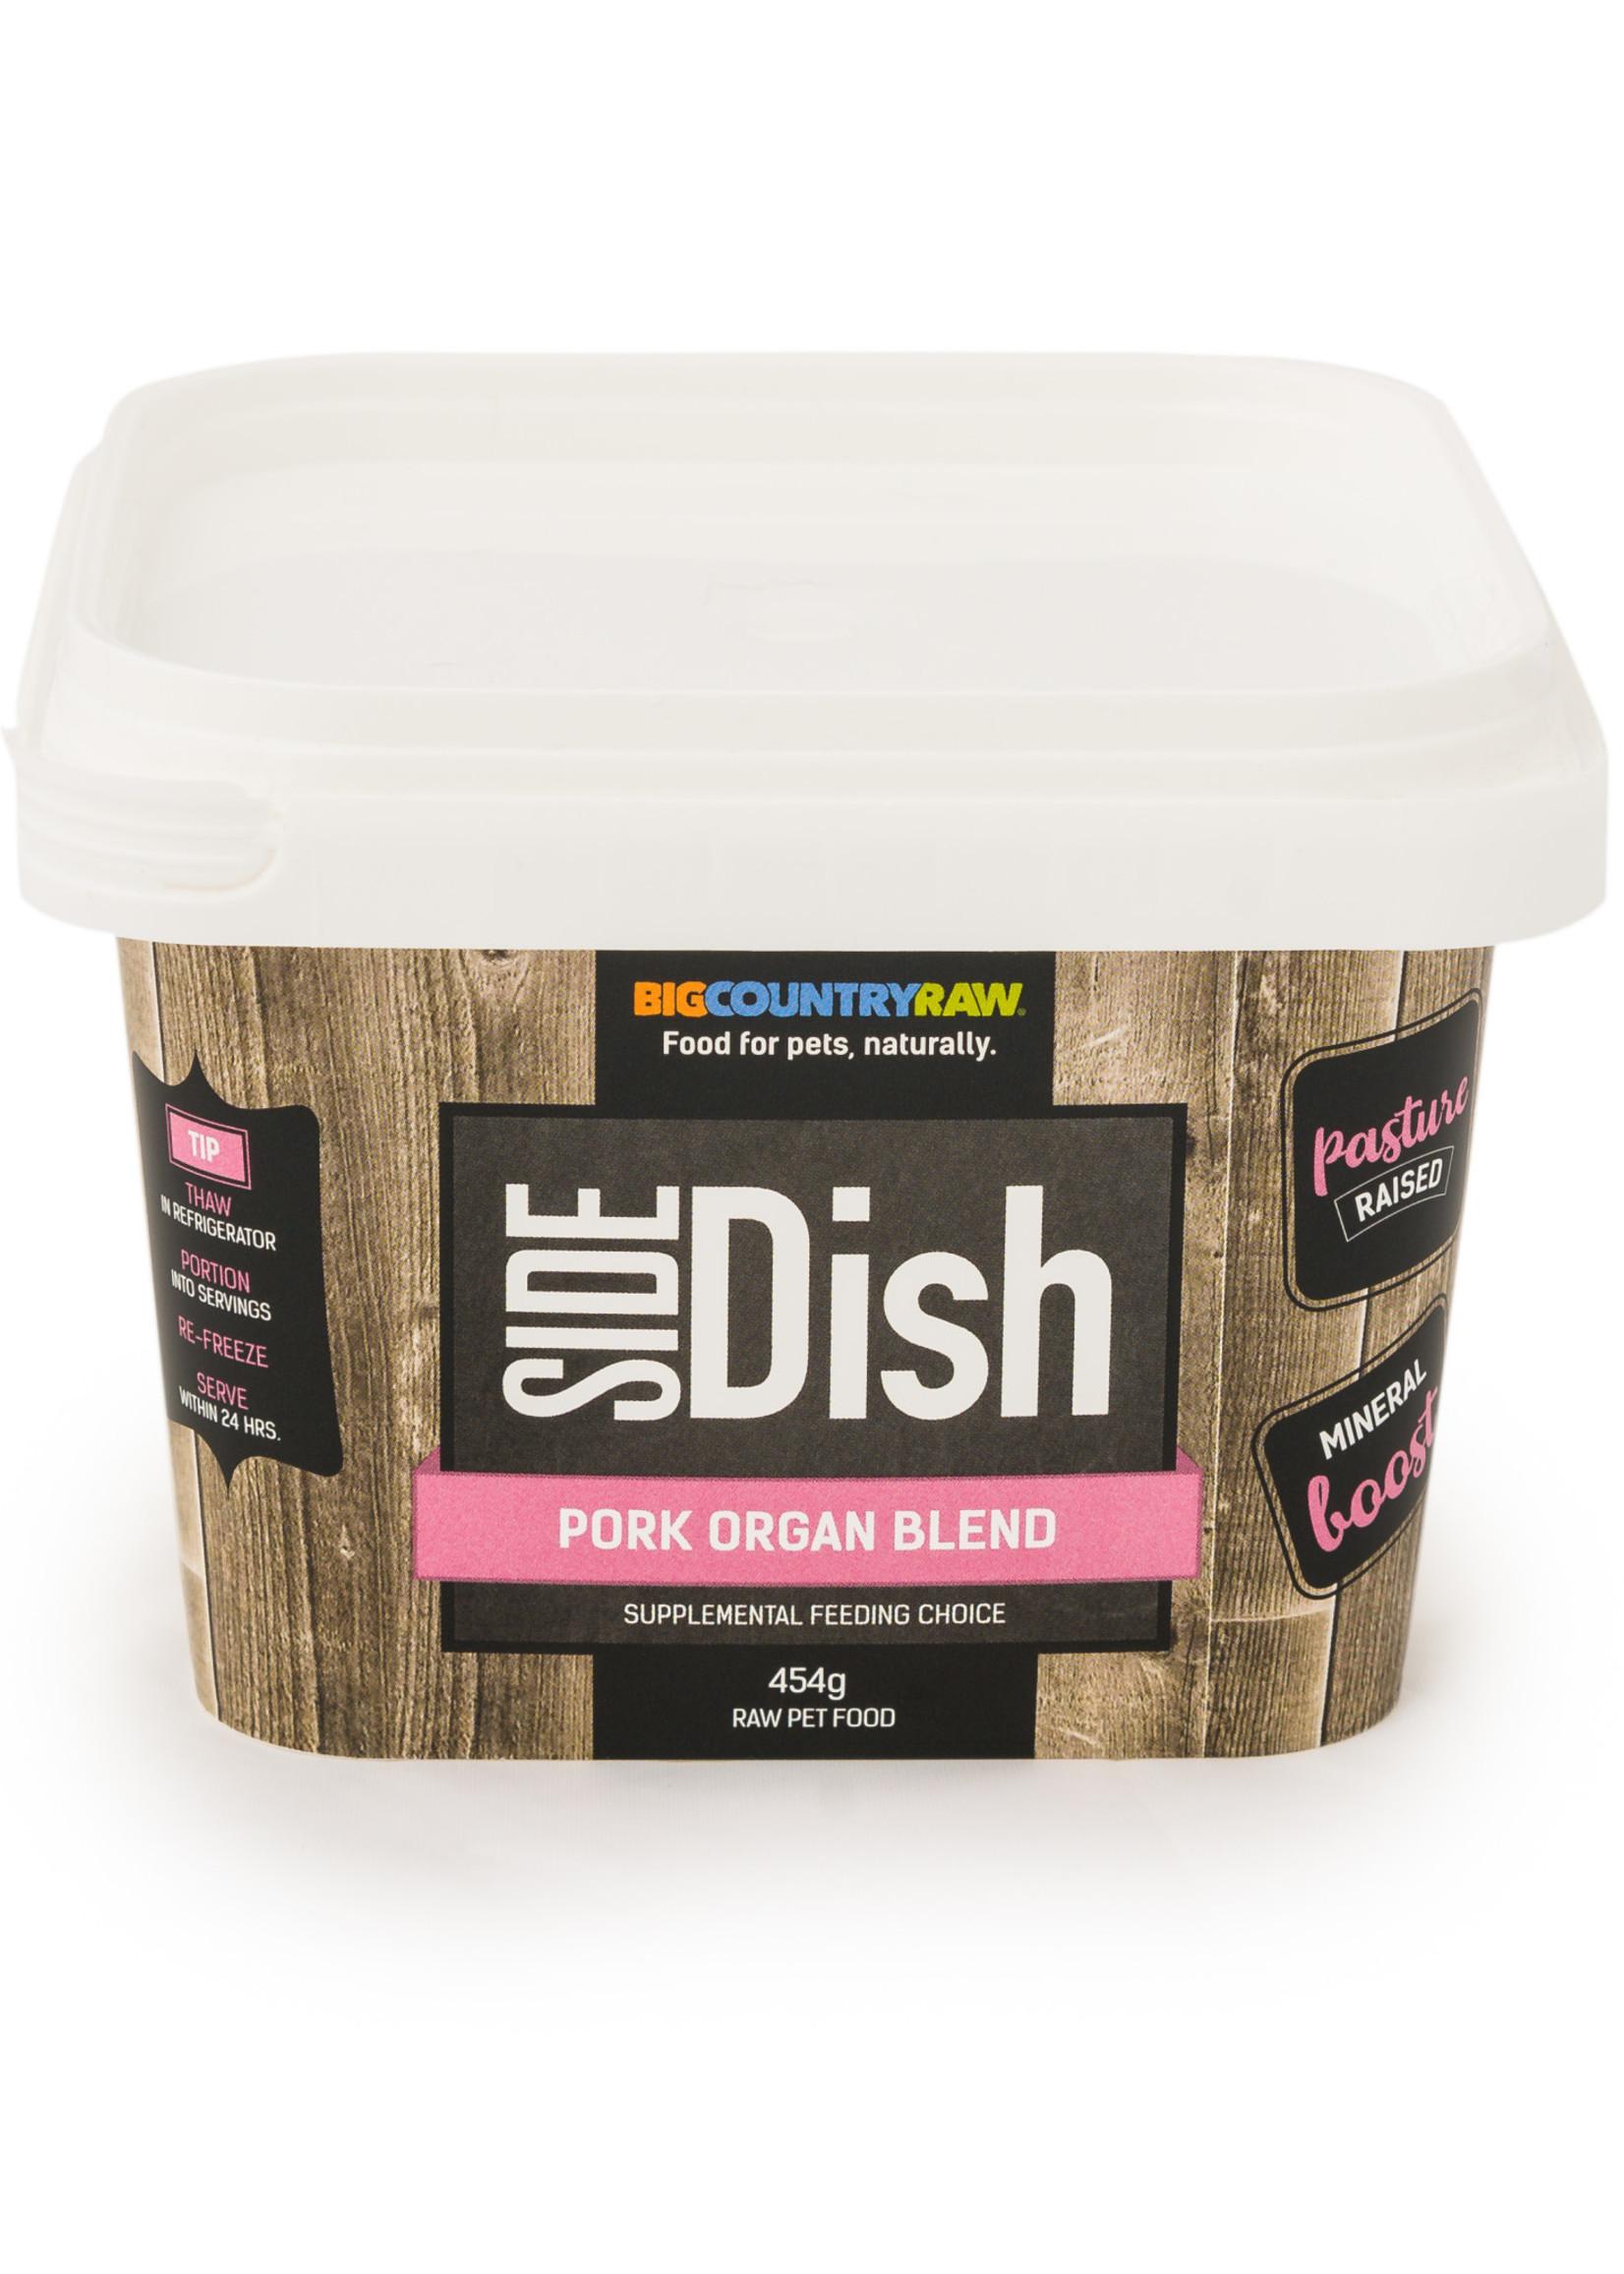 Big Country Raw Big Country Raw Side Dish Pork Organ Blend 1lb